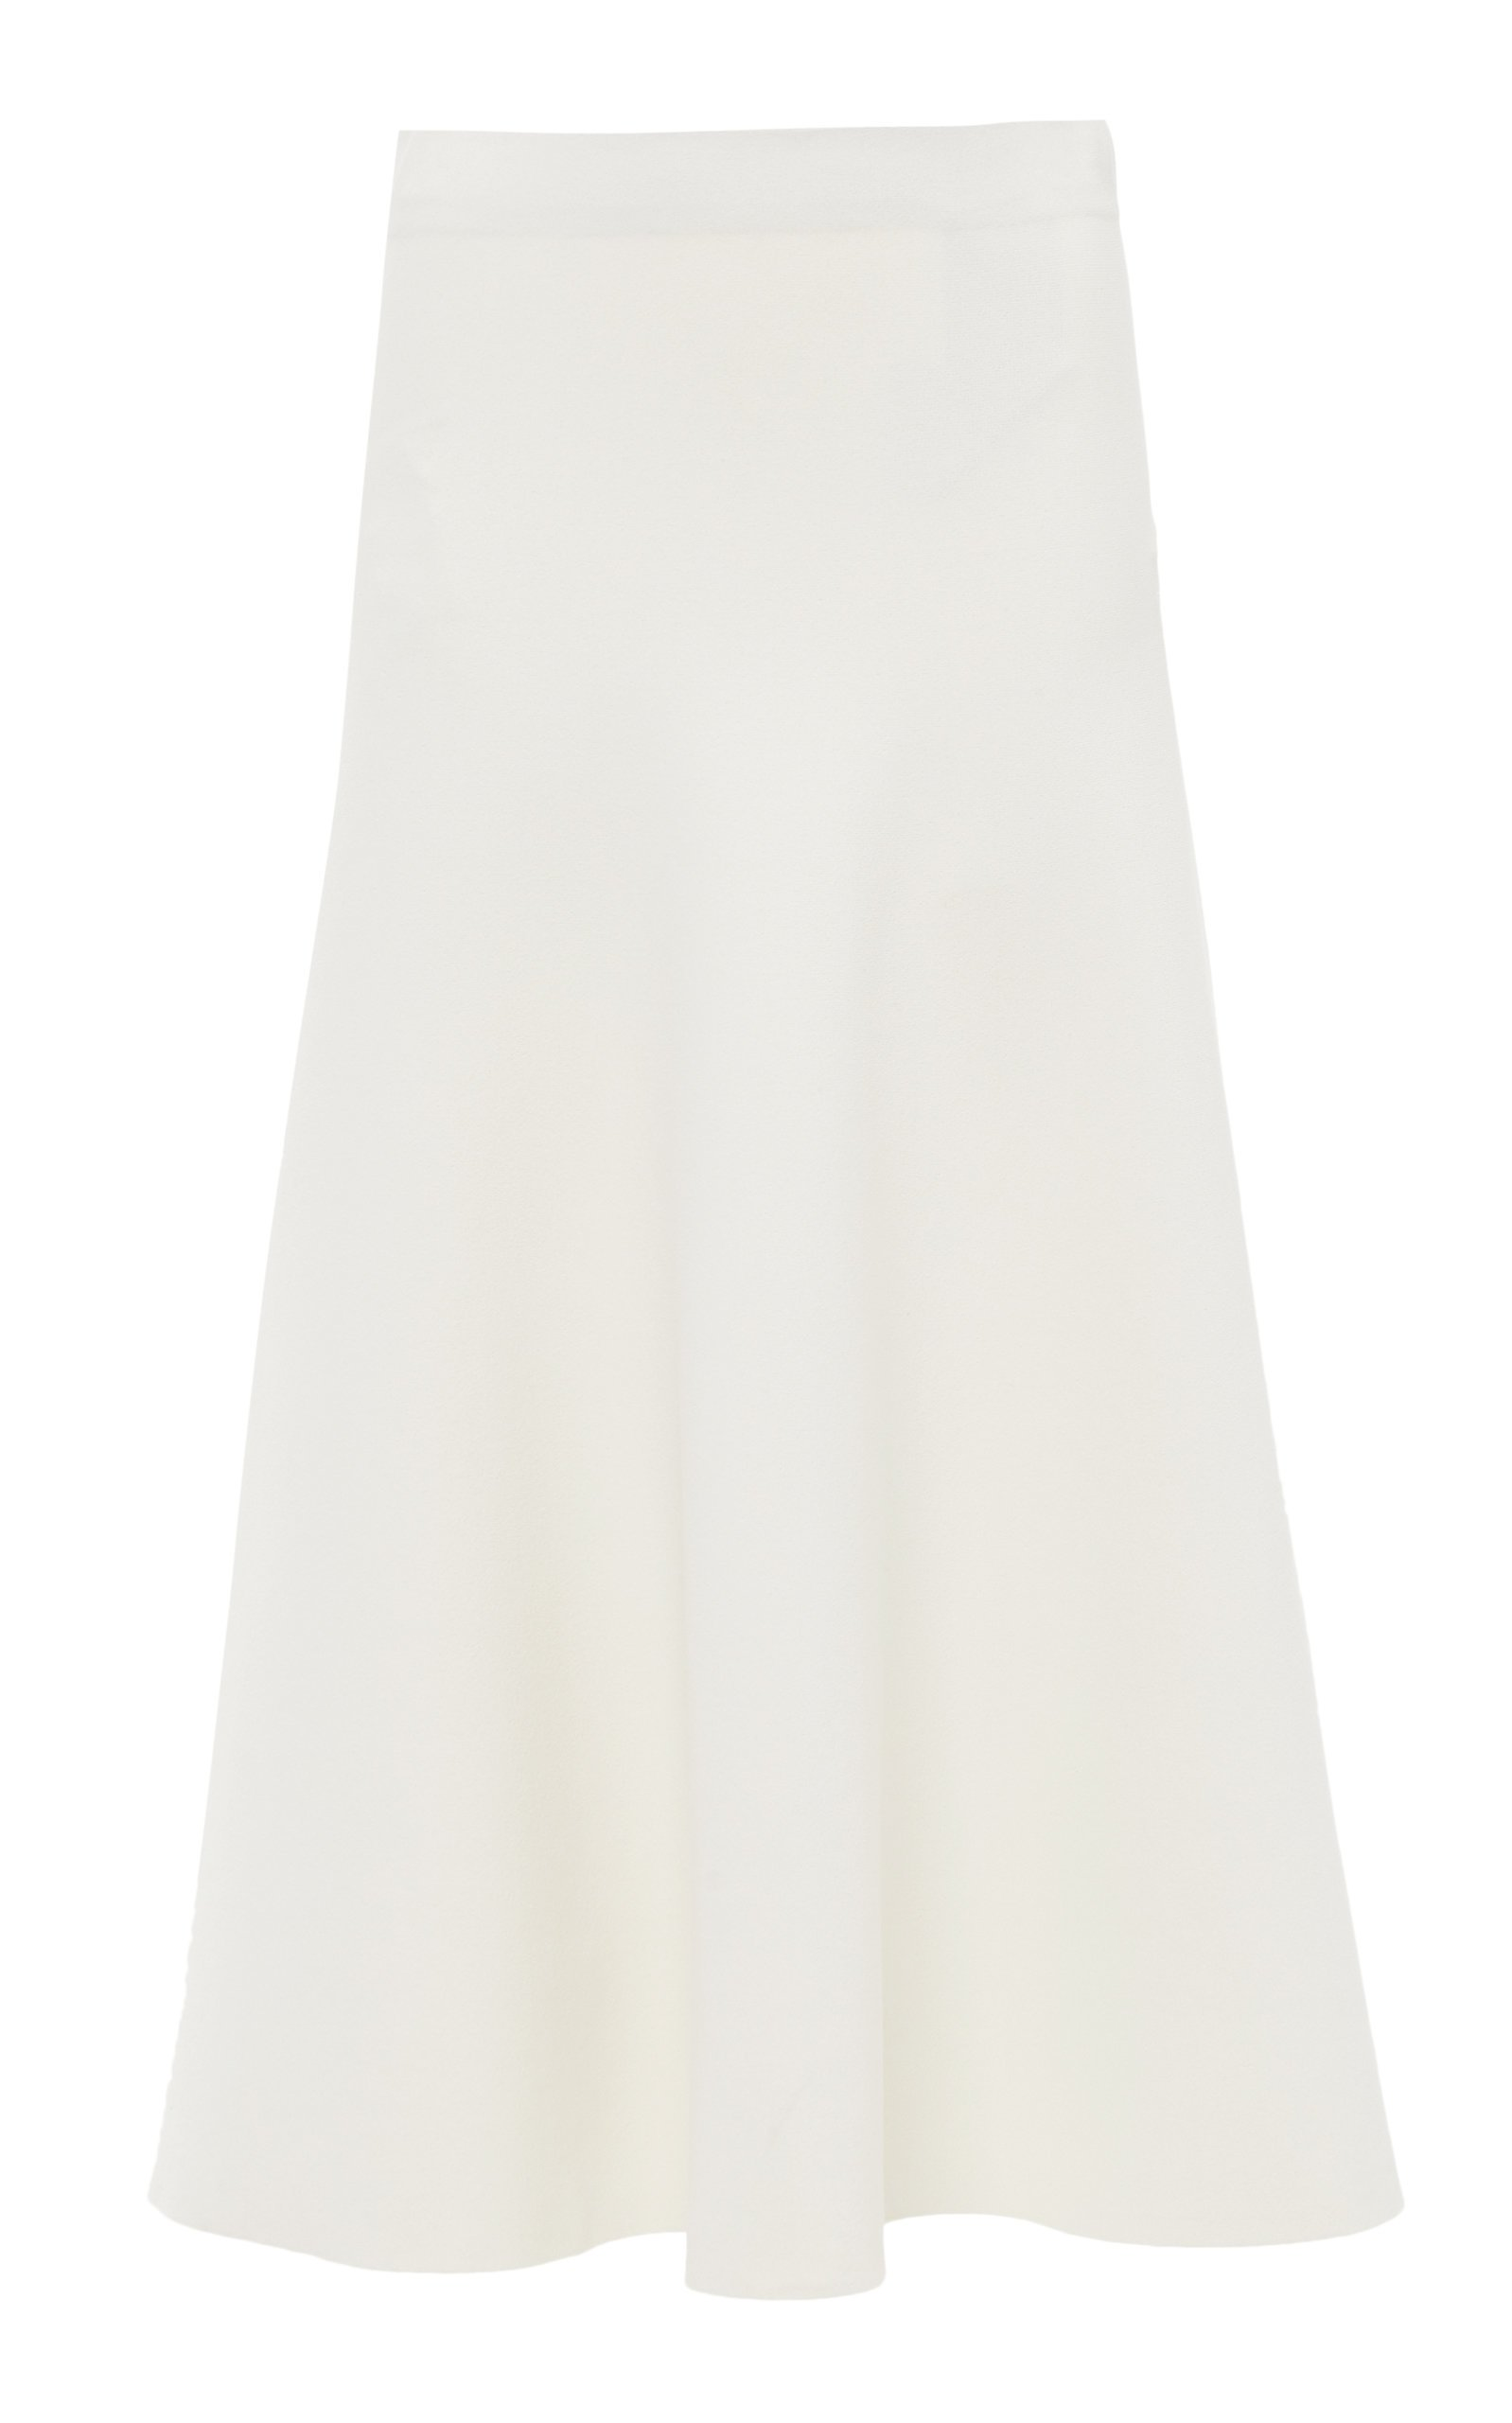 Jil Sander Crepe Midi Skirt Size: 38